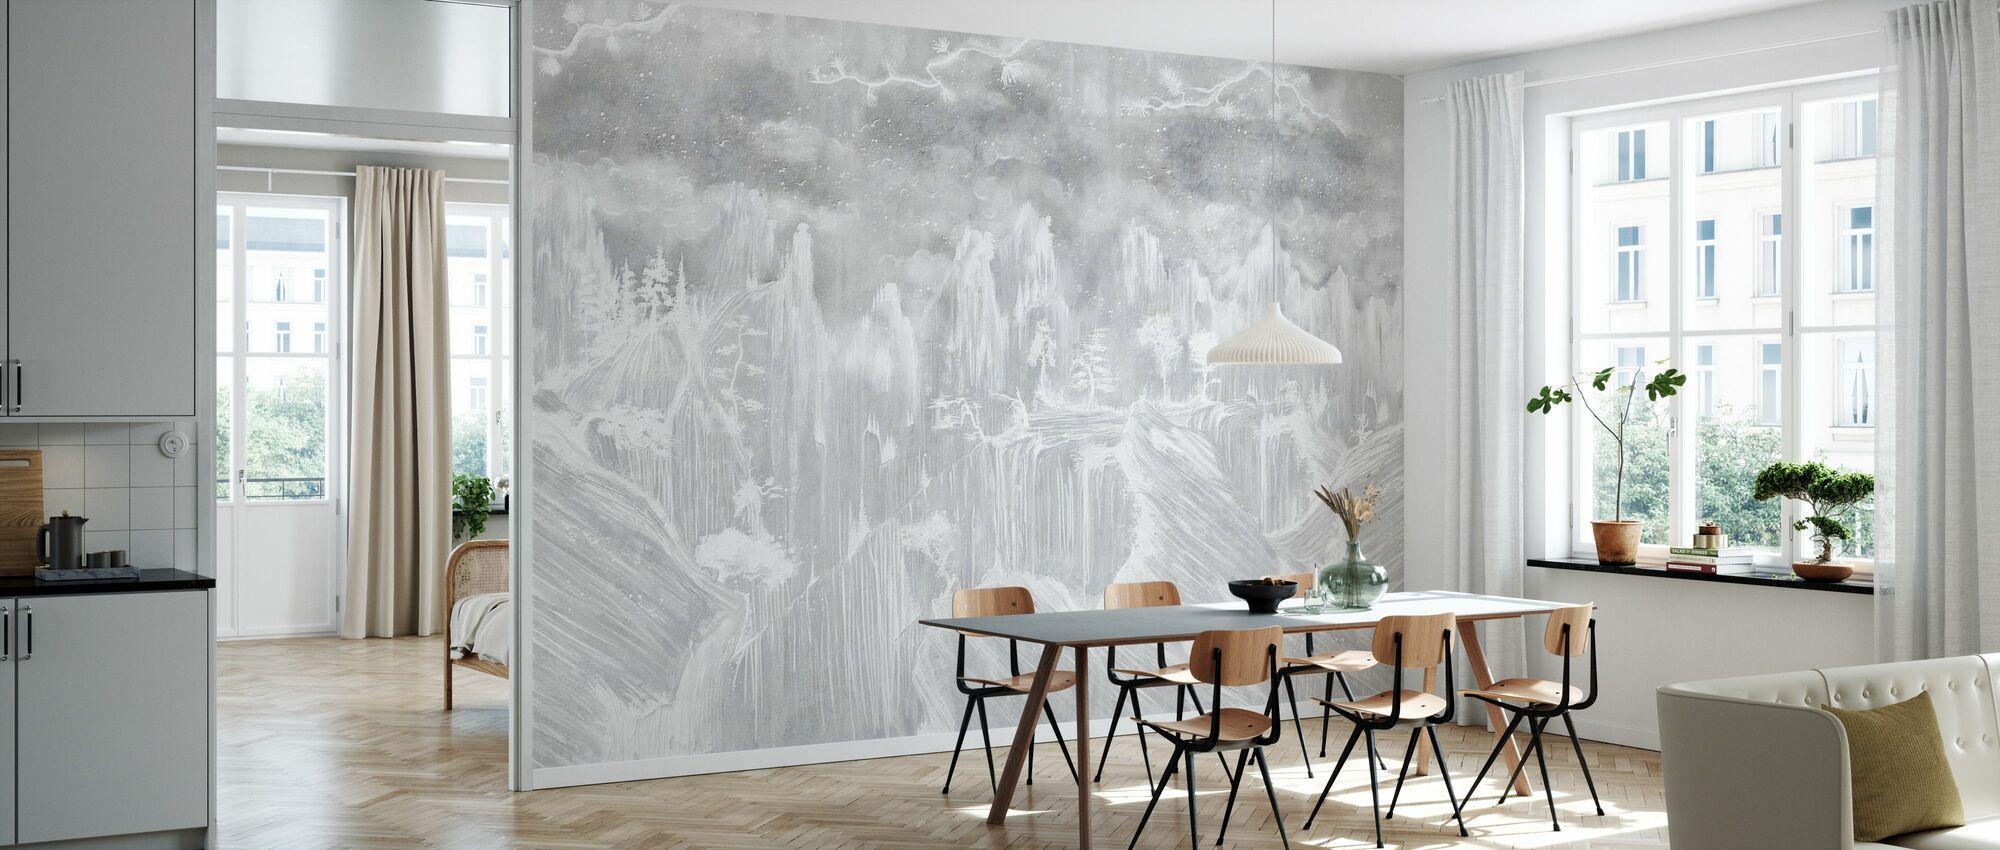 Orientalisk betong - ljus - Tapet - Kök